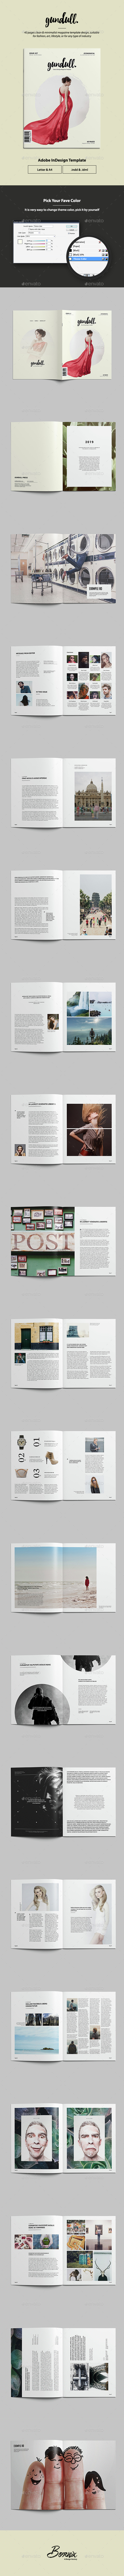 Gundull Clean Magazine Template - Magazines Print Templates